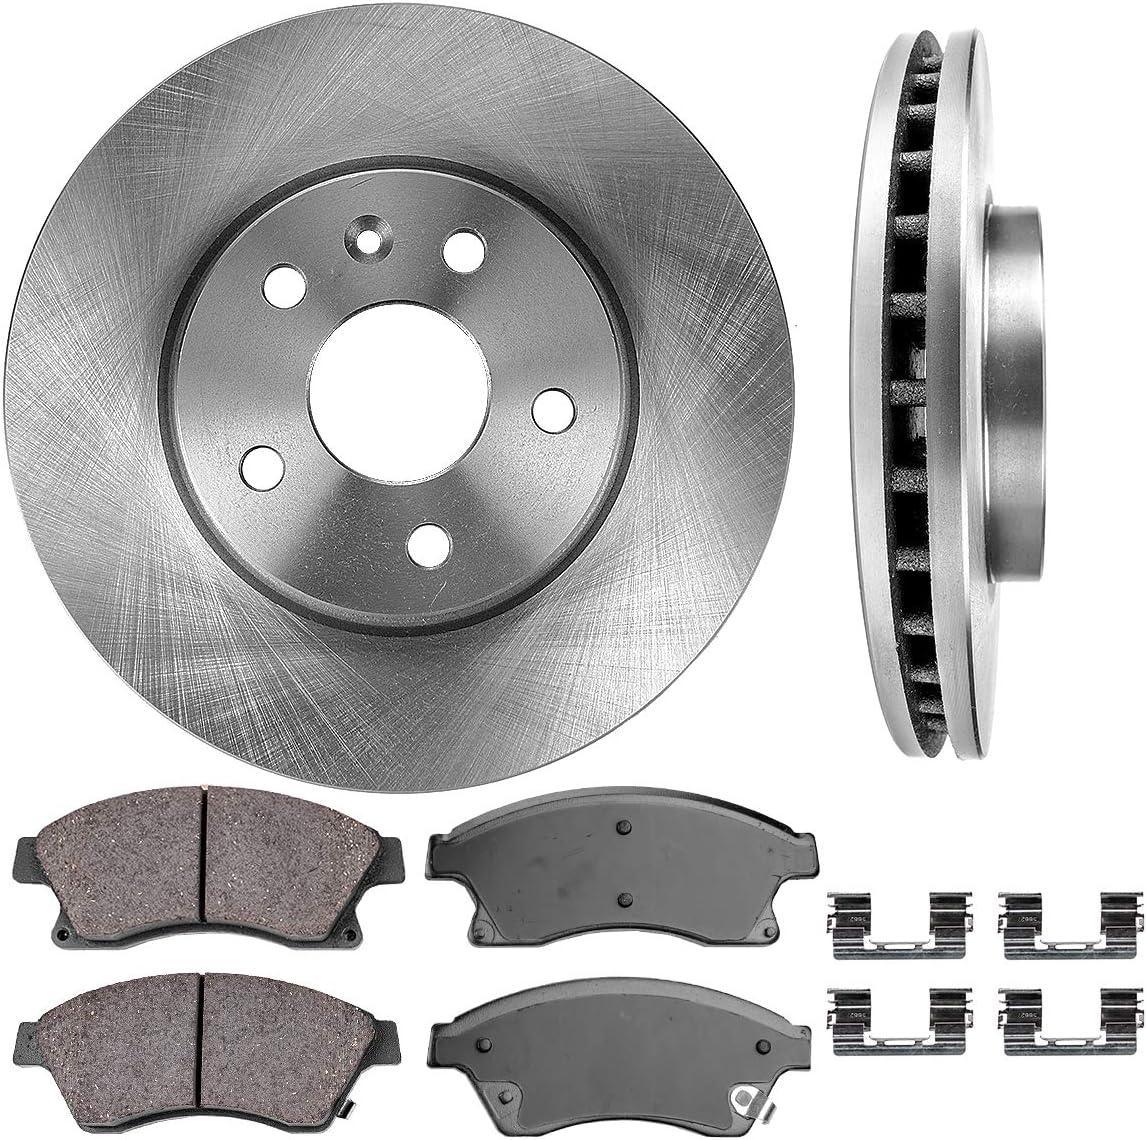 High-End Fits:- 5lug 4 Cross-Drilled Disc Brake Rotors 8 Ceramic Pads Front+Rear Kit